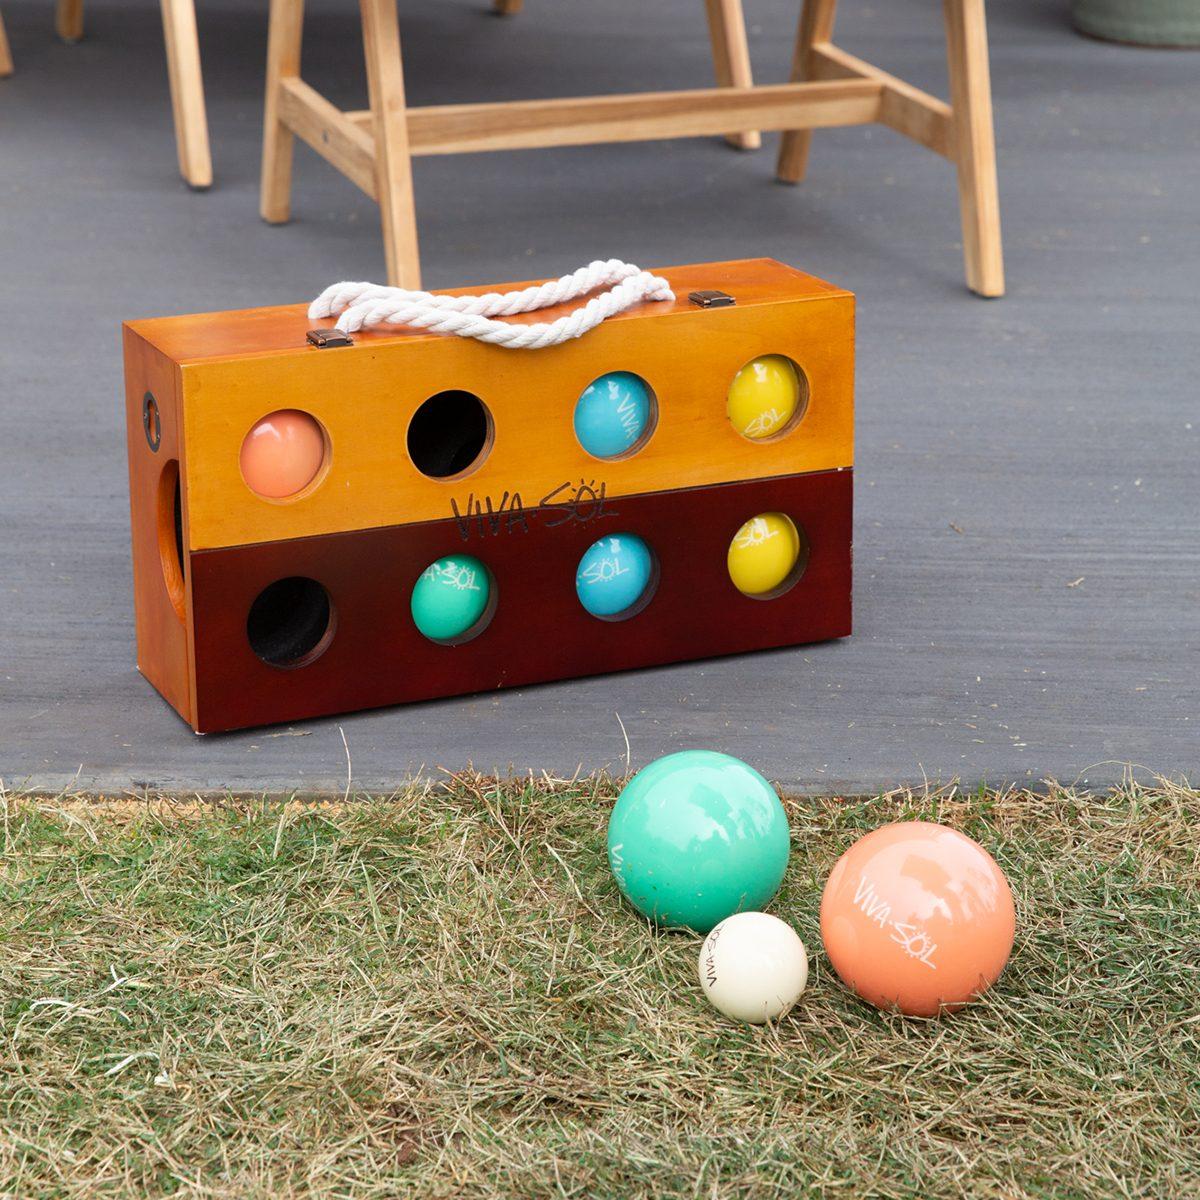 Bocce ball set at the Shed